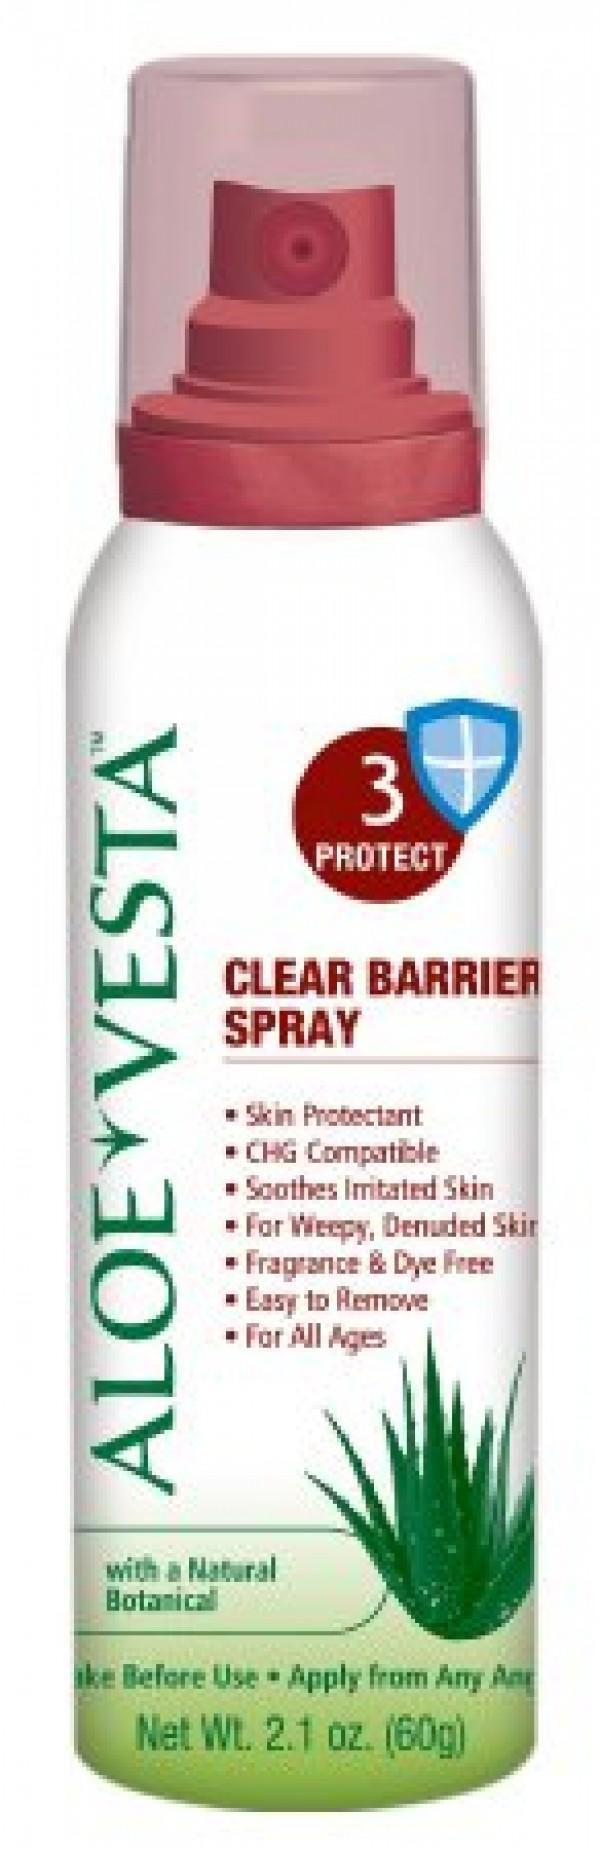 ConvaTec Aloe Vesta Protective Barrier Spray 2.1 oz